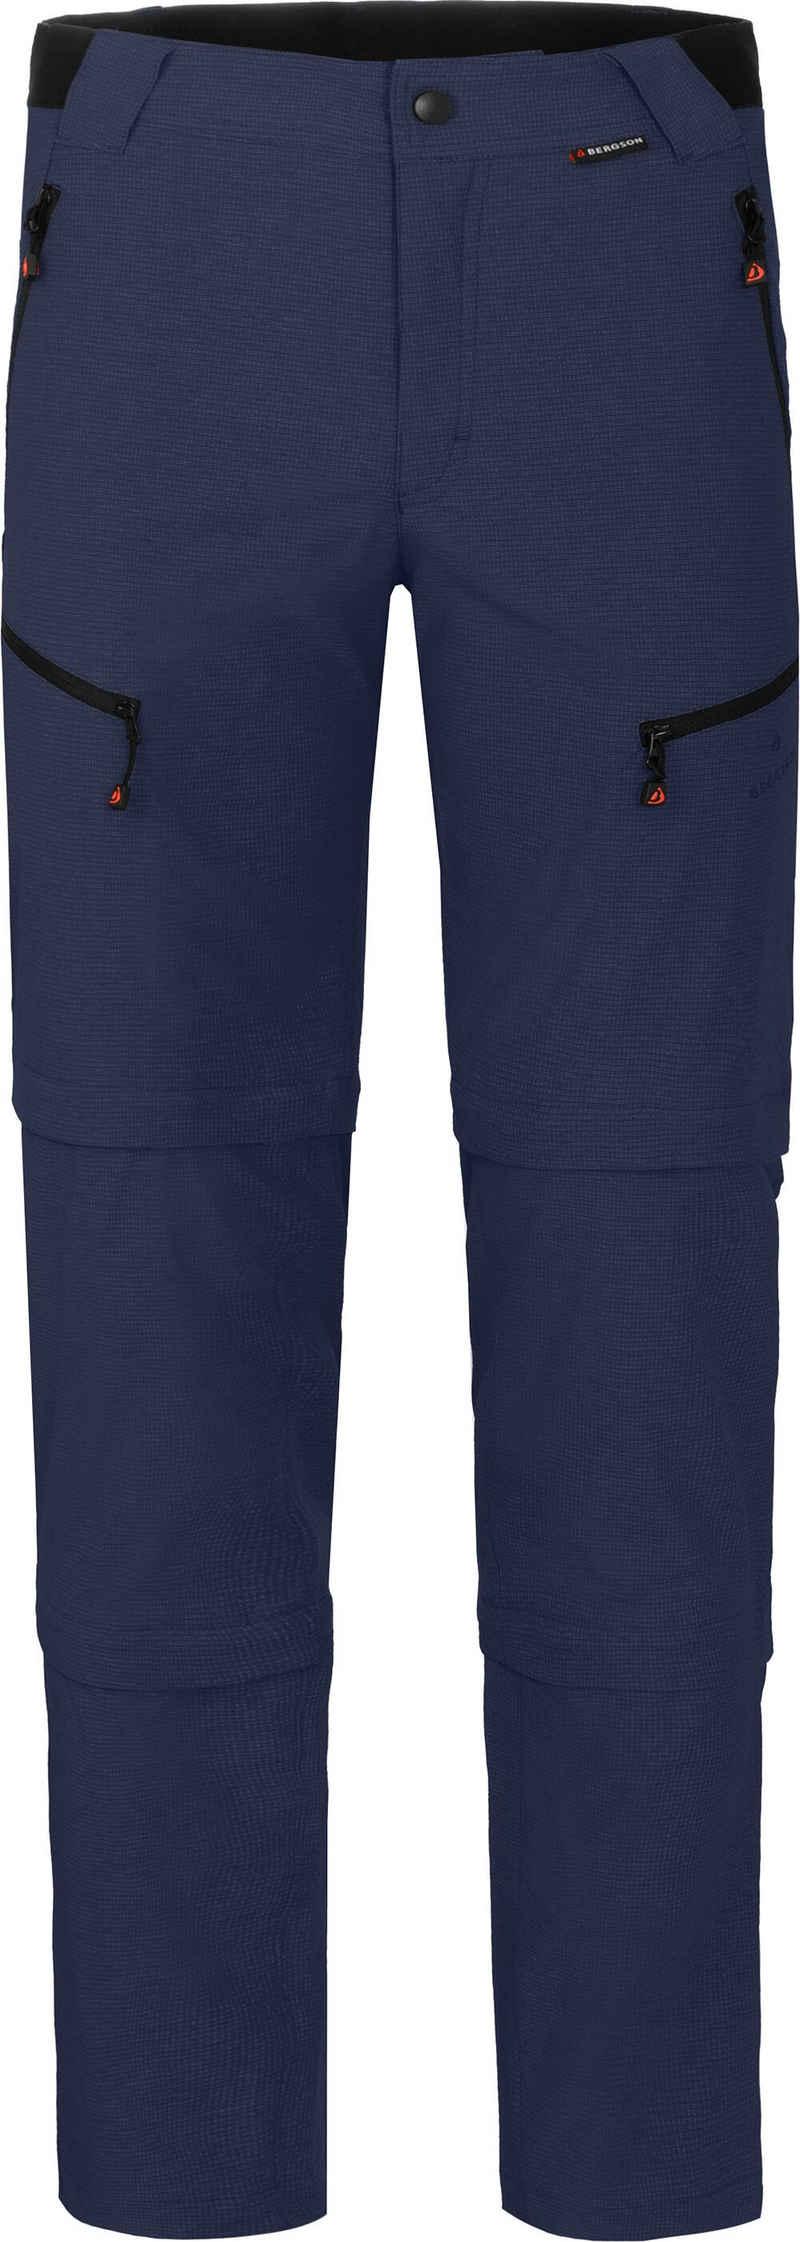 Bergson Zip-off-Hose »LEBIKO Doppel Zipp-Off mit T-ZIPP« Herren Wanderhose, robust elastisch, Normalgrößen, peacoat blau